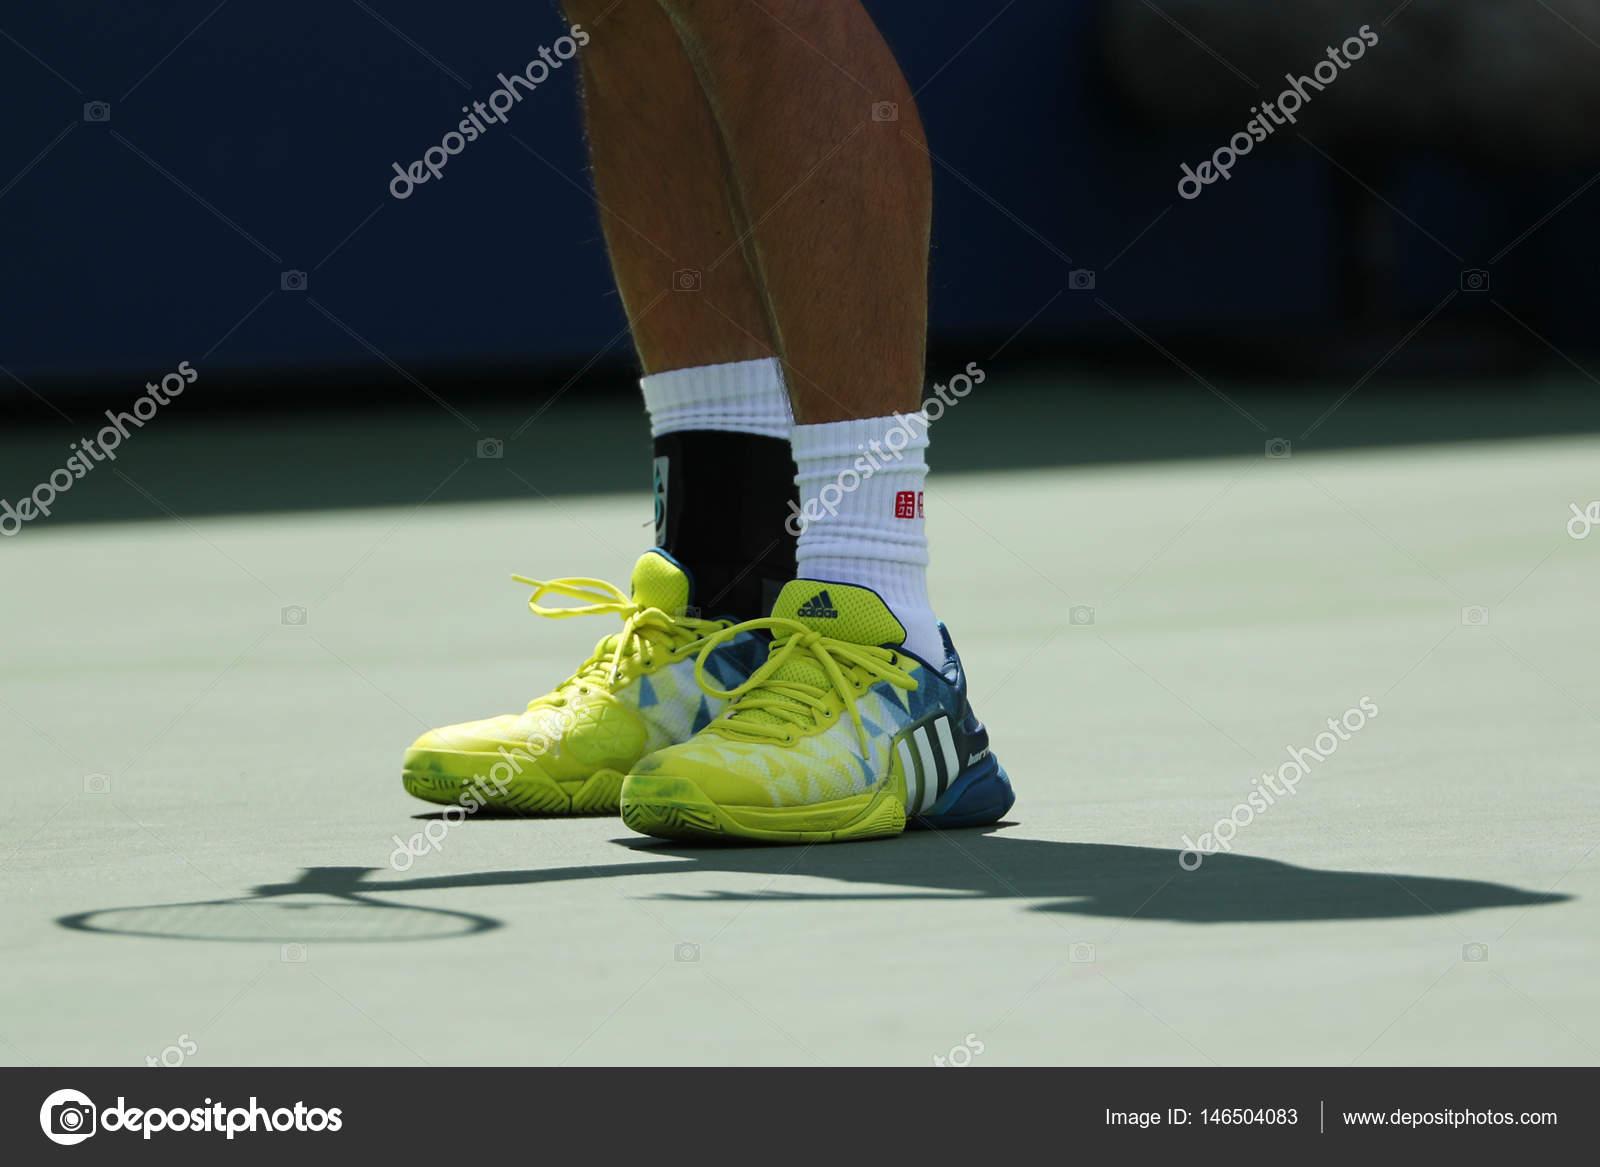 Kei Nishikori Tenista Japón lleva zapatillas de profesional f7mIgb6vYy